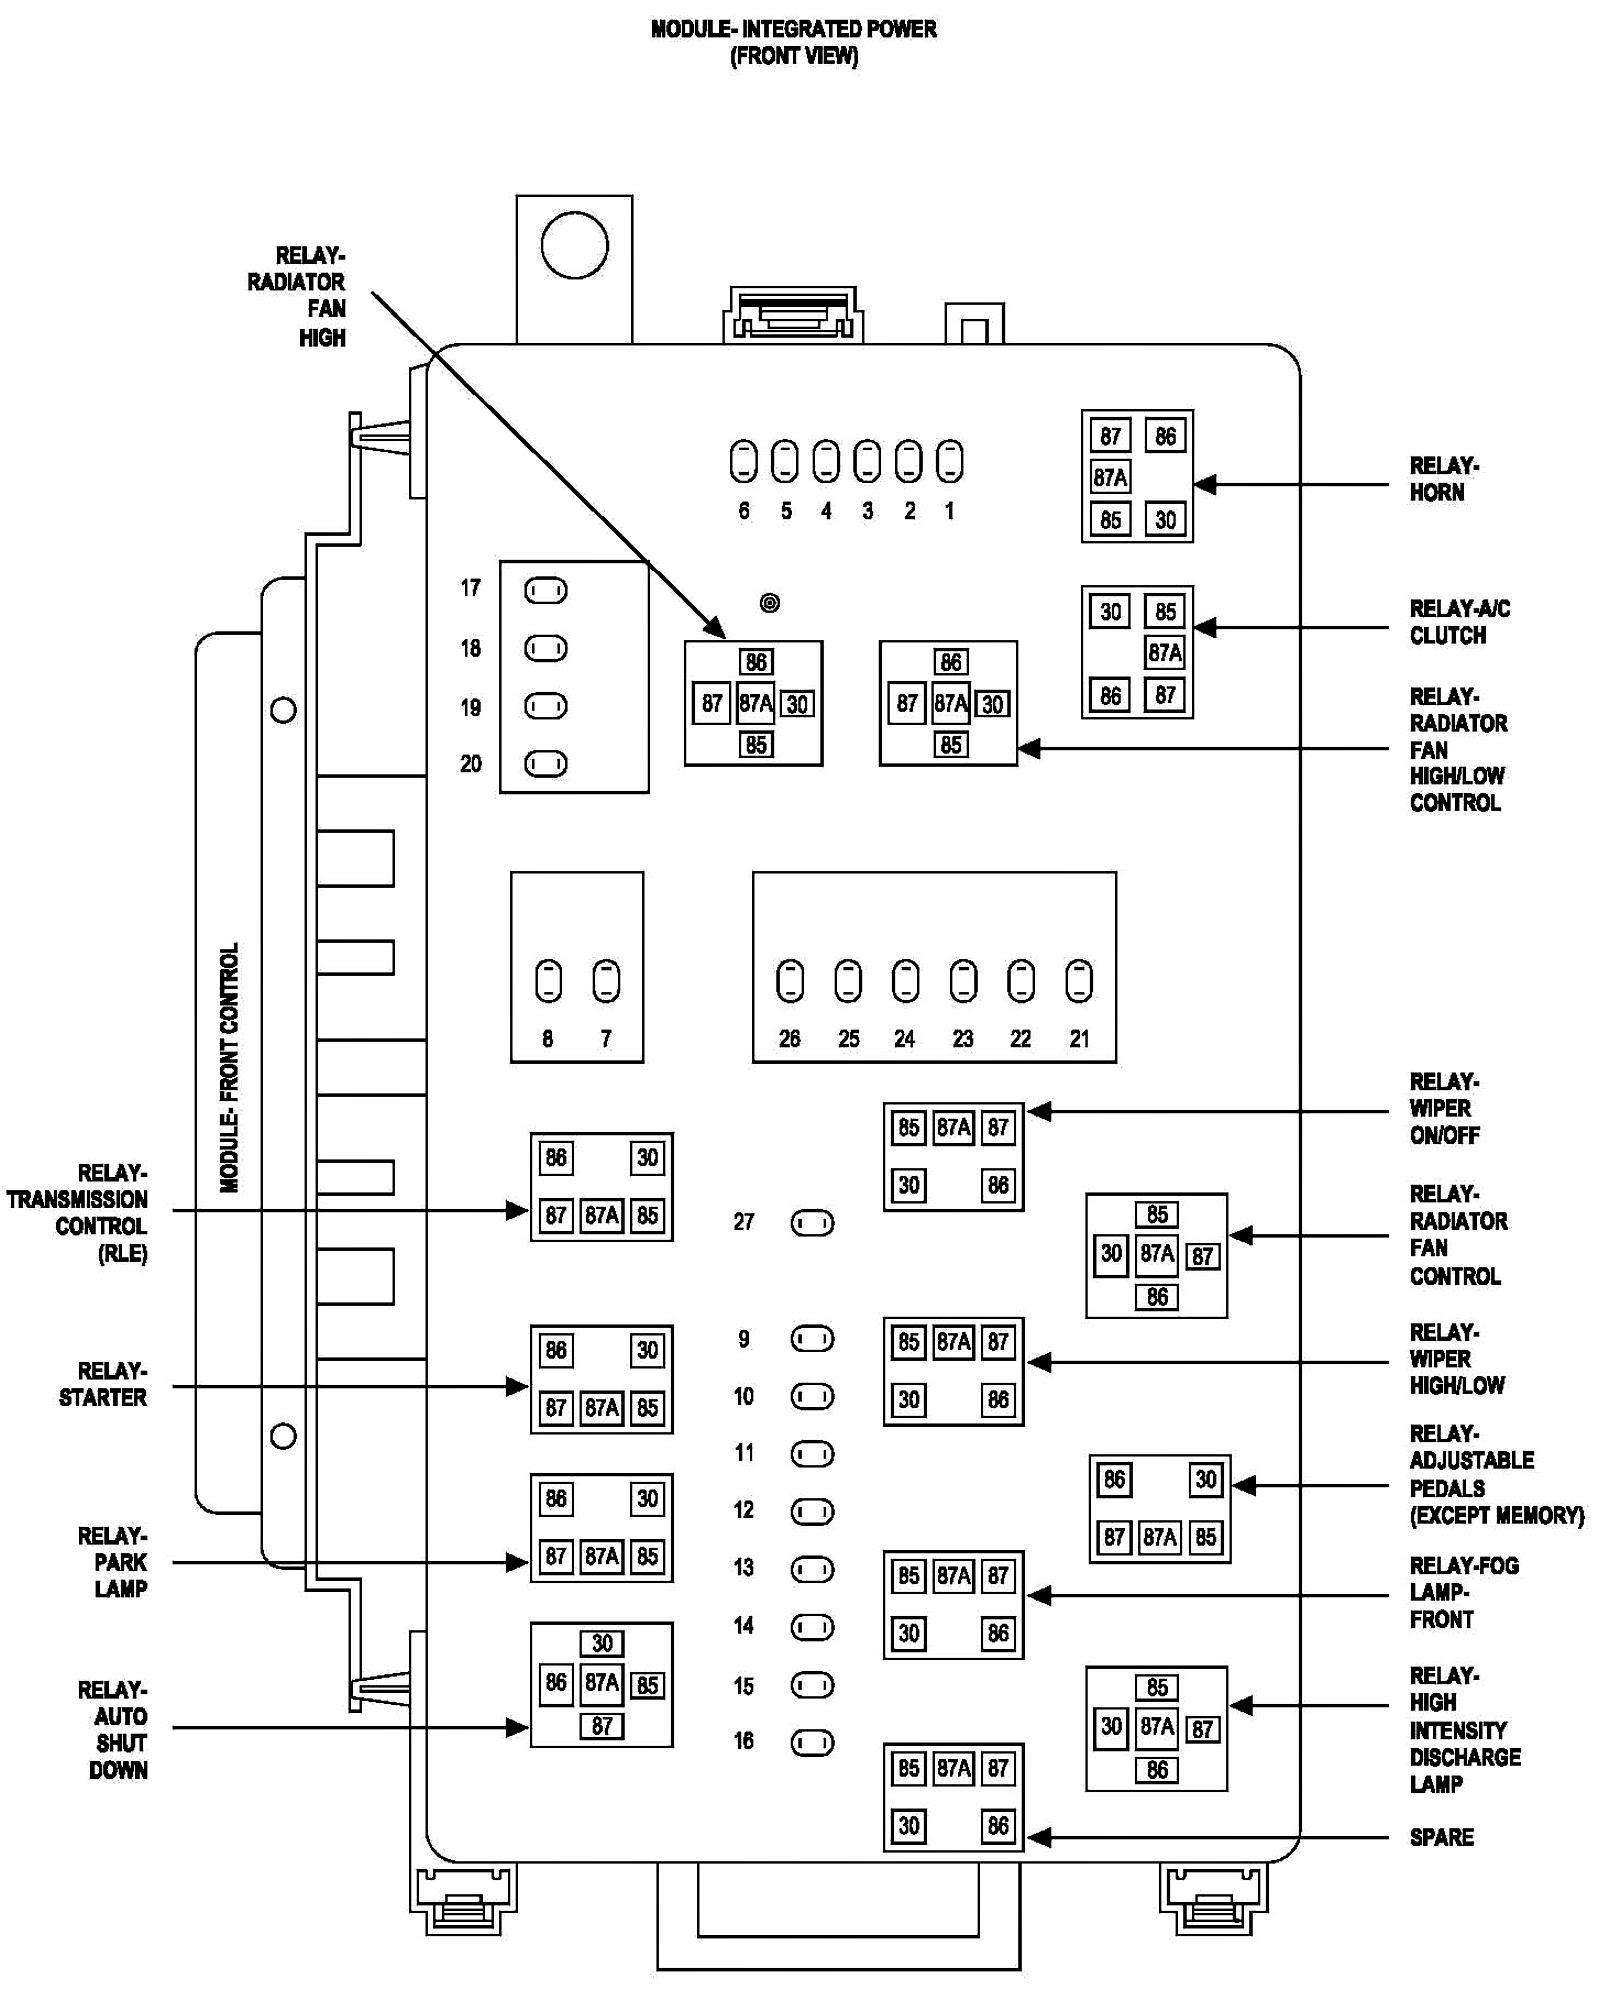 2005 Town And Country Fuse Box Wiring Diagrams Data Crew Improve Crew Improve Ungiaggioloincucina It